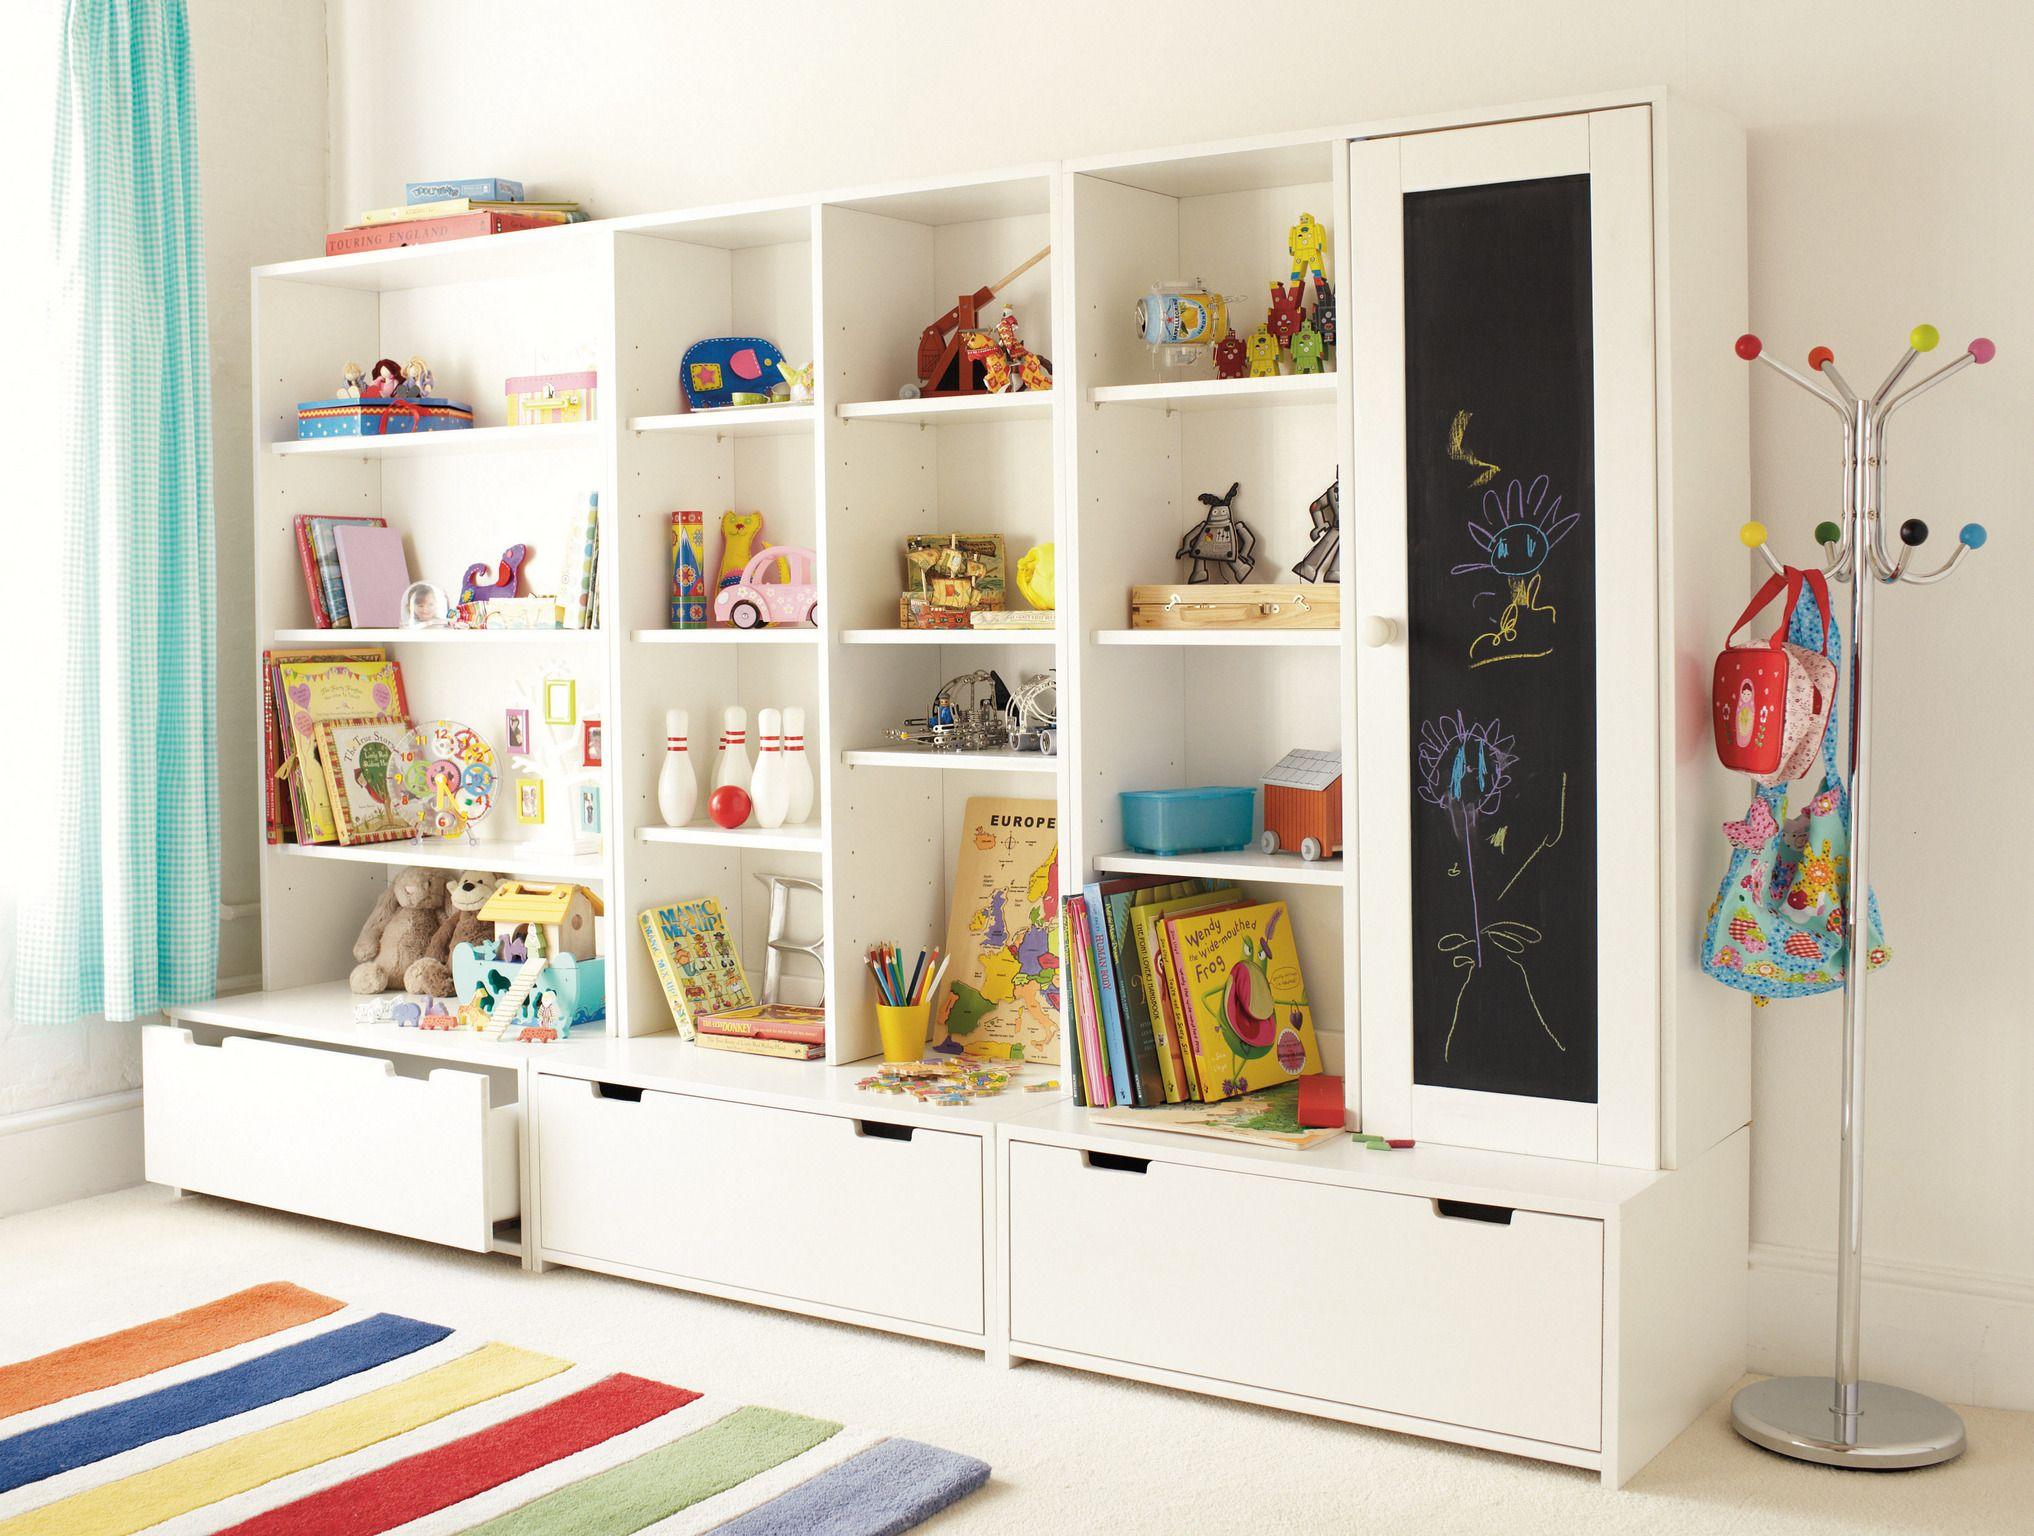 Also Ikea Fun Toy Storage Unit Storage Kids Room Toy Room